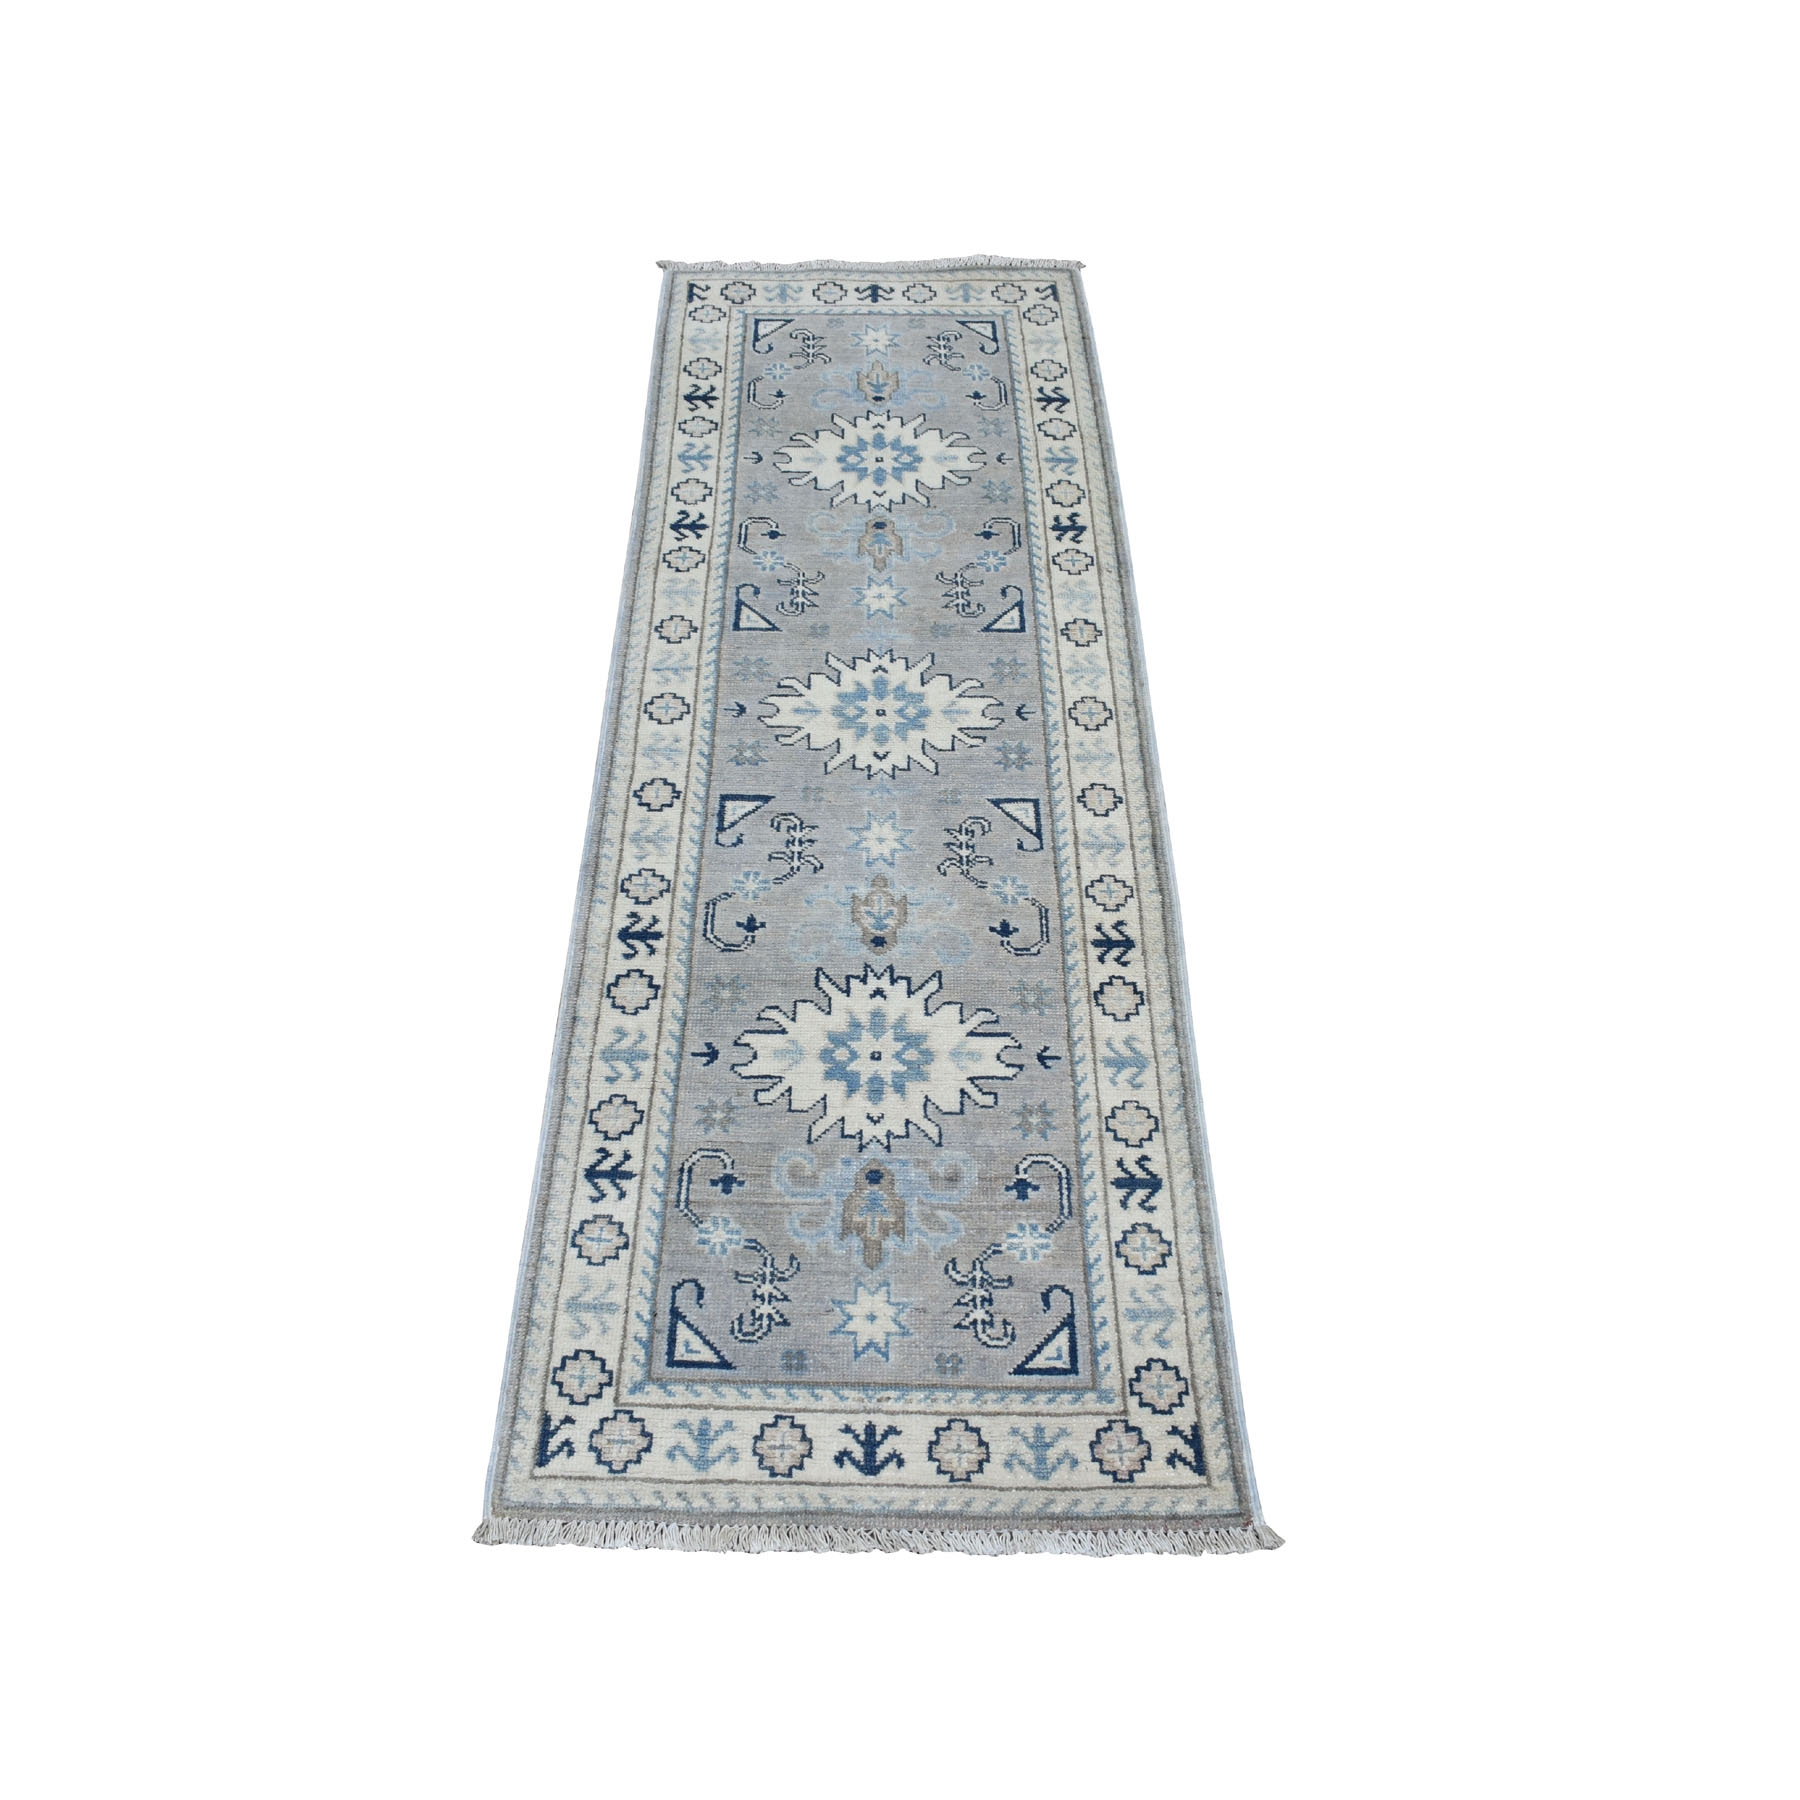 "2'x5'9"" Vintage Look Kazak Geometric Design Runner Pure Wool Hand Knotted Oriental Rug"